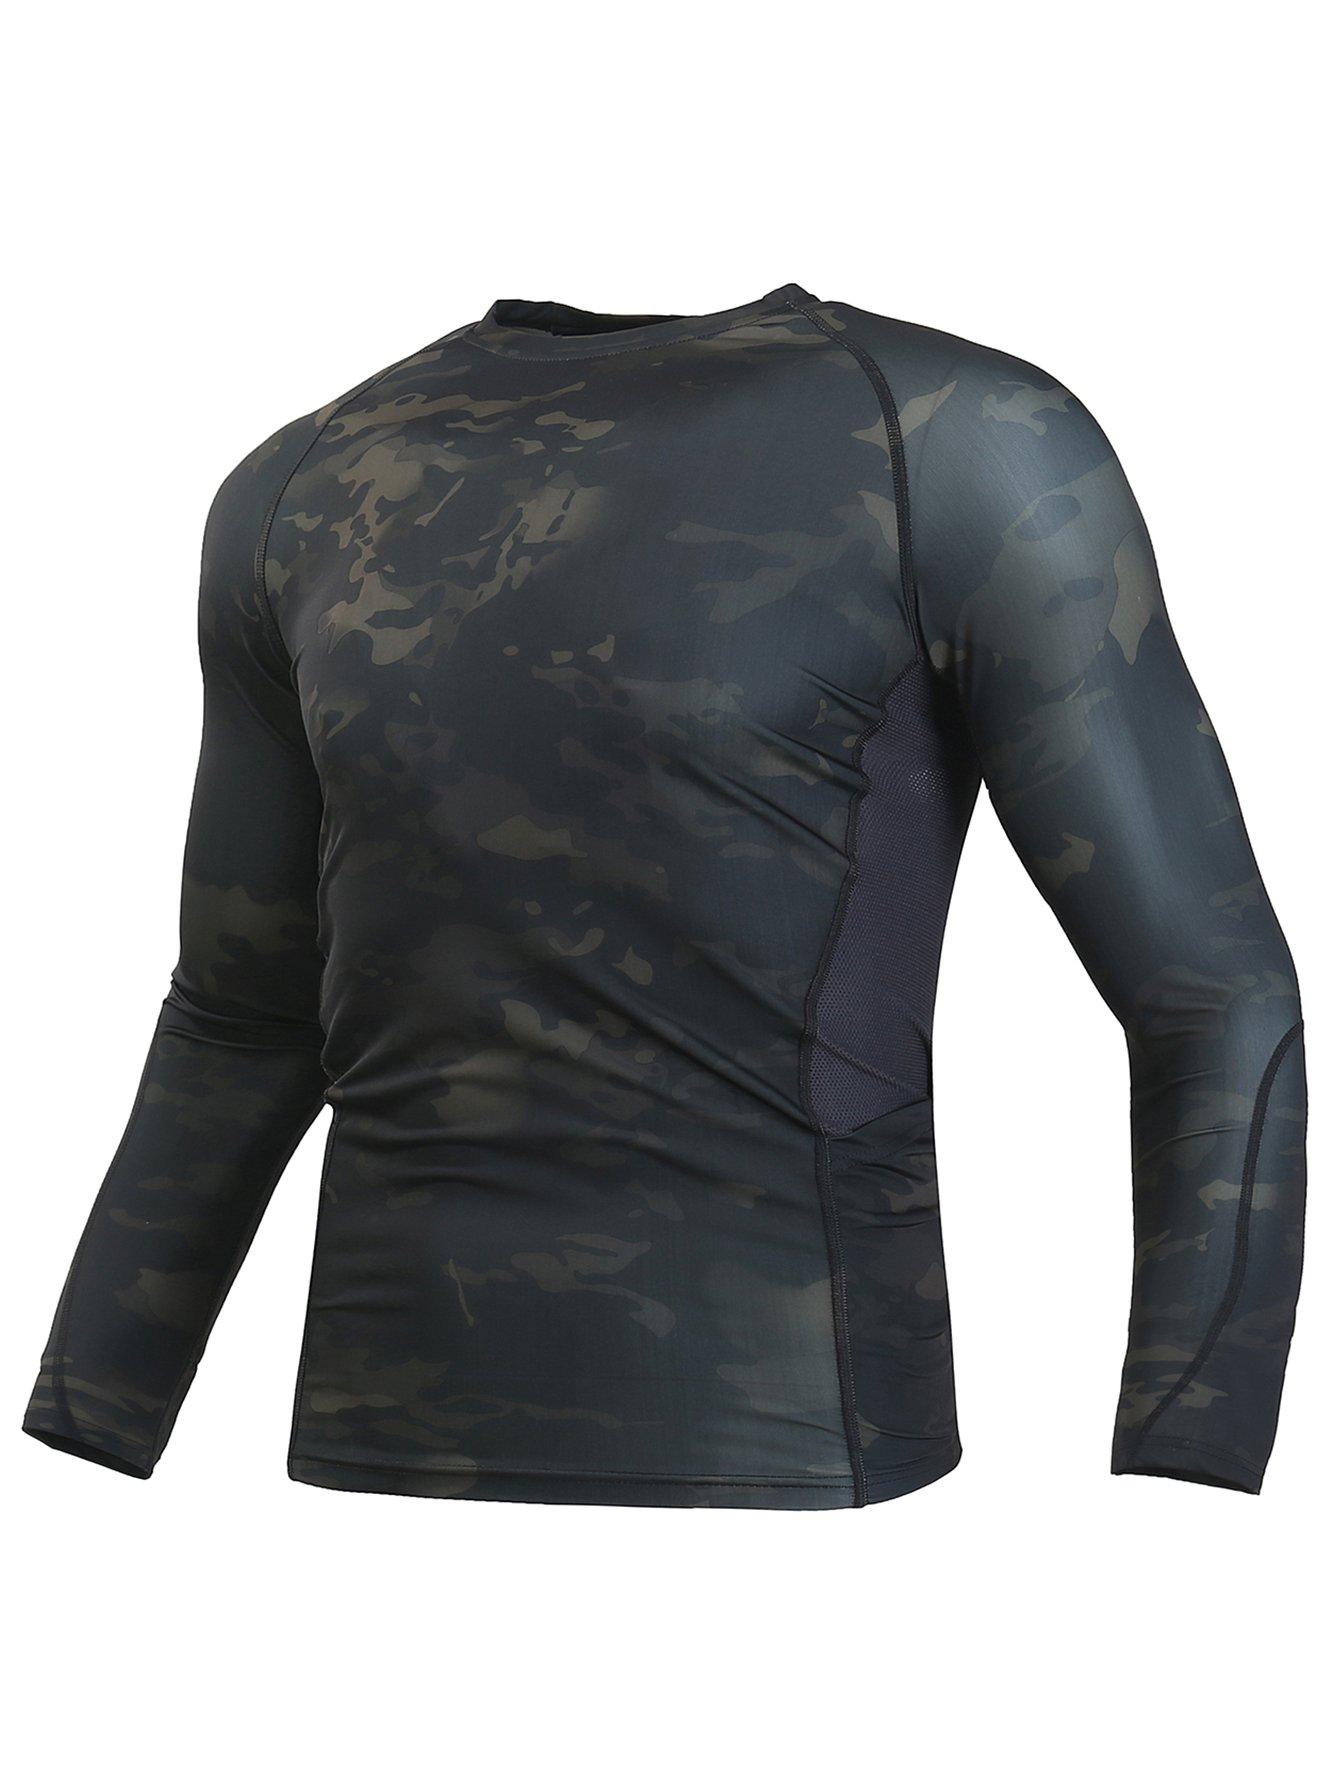 WARCHIEF 战术长袖短袖衬衫迷彩* T 恤运动装